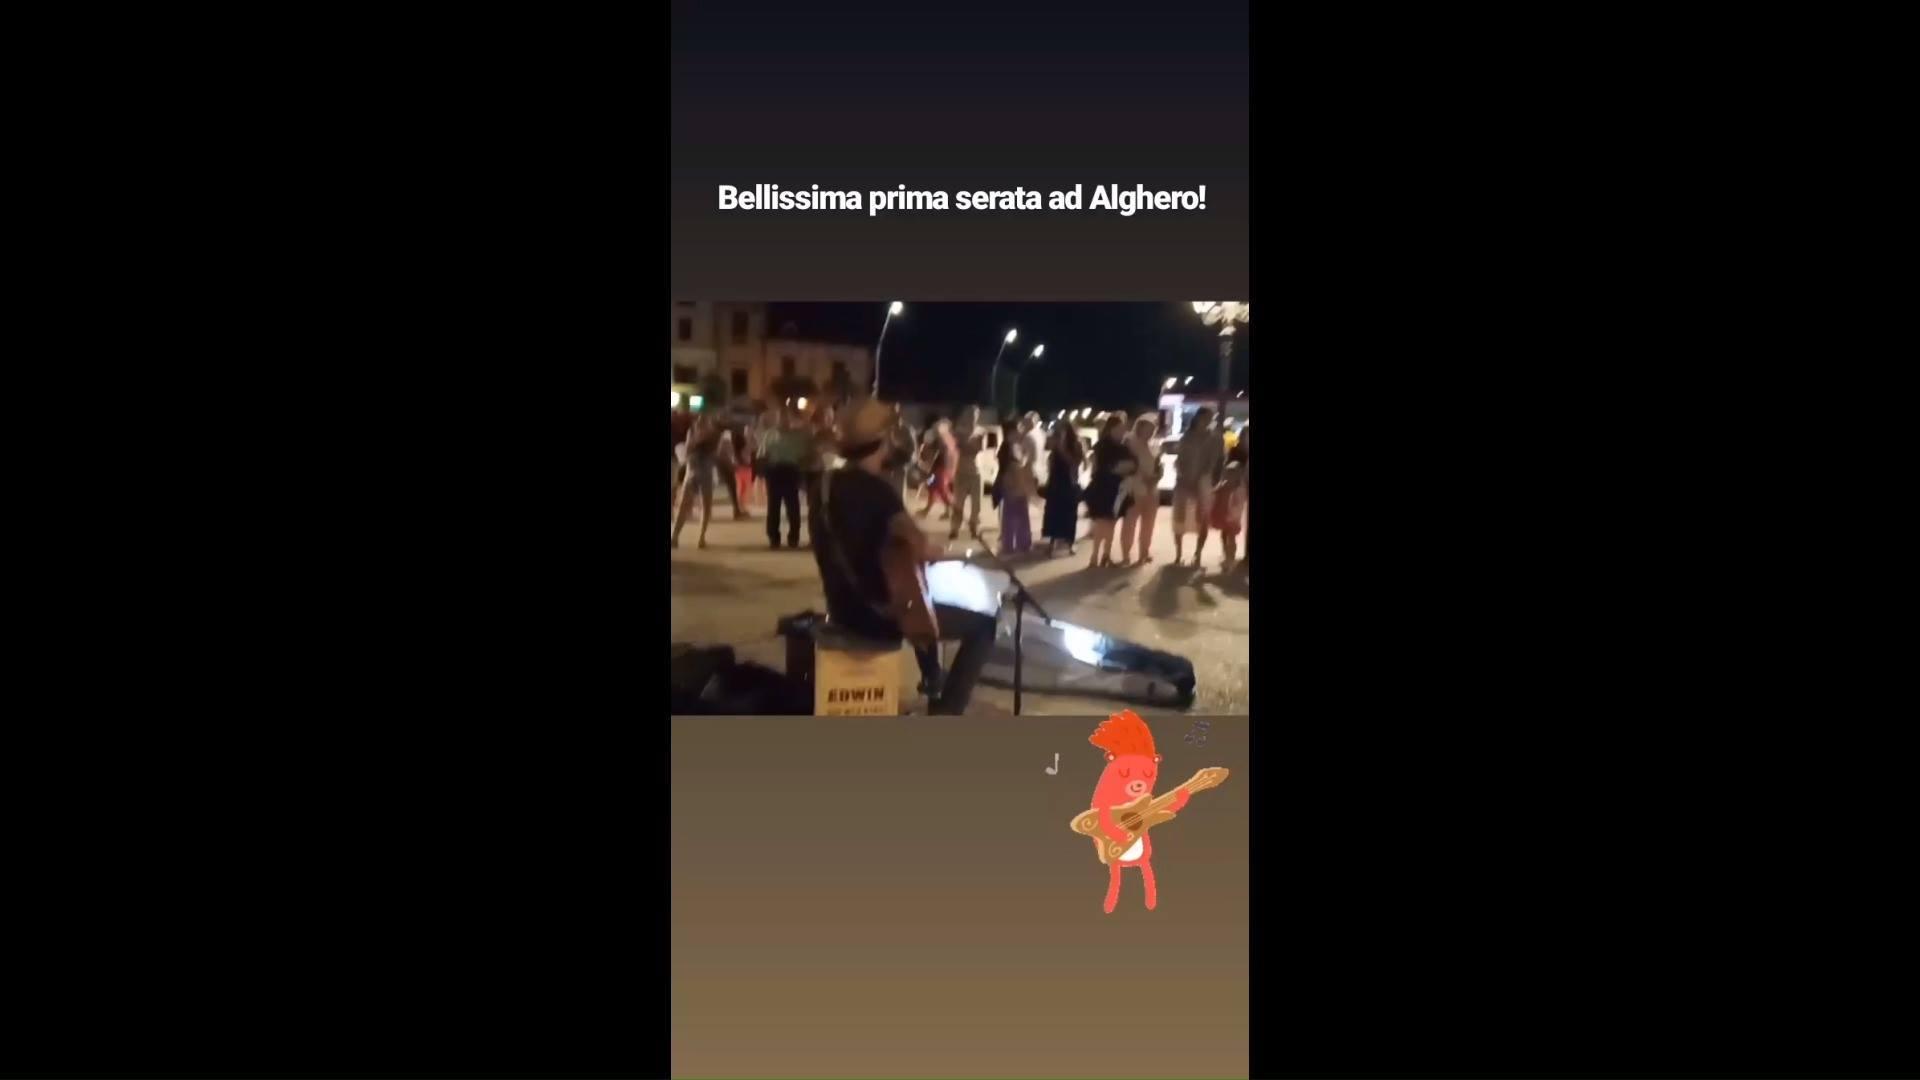 13/07 - Day 1 - Alghero (SS)